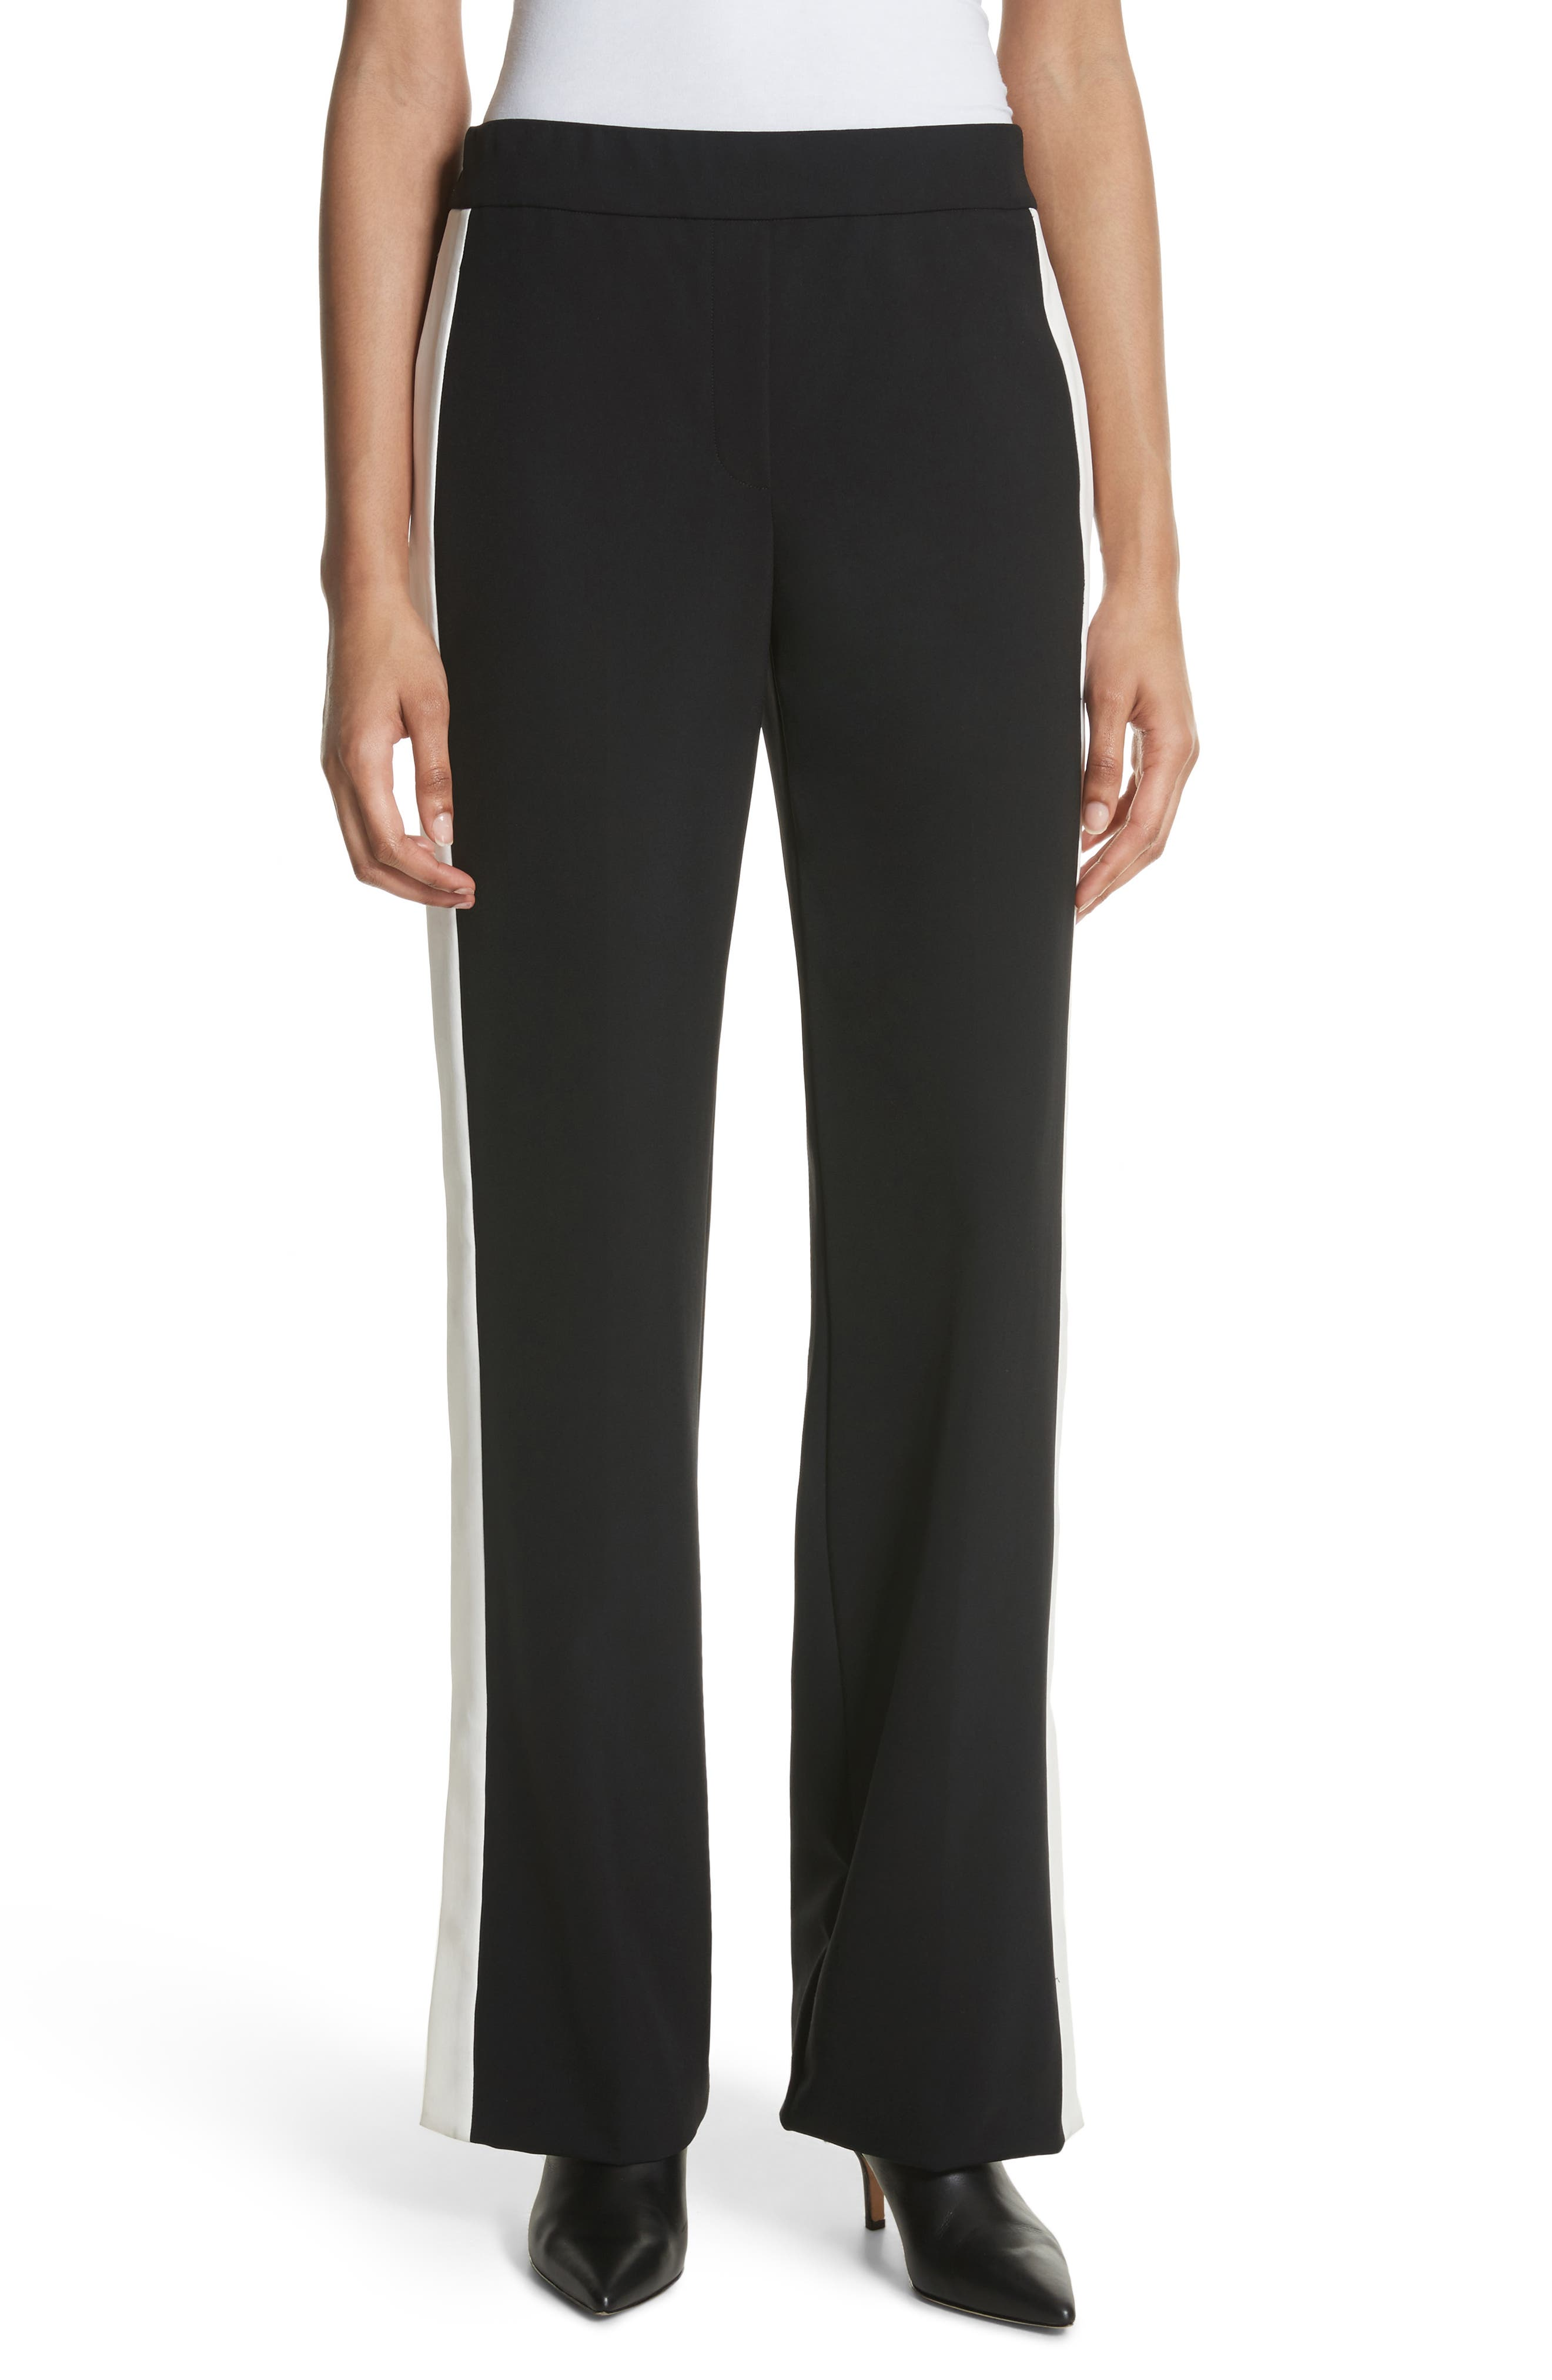 Snap Side Track Pants,                             Main thumbnail 1, color,                             Black/ Ivory